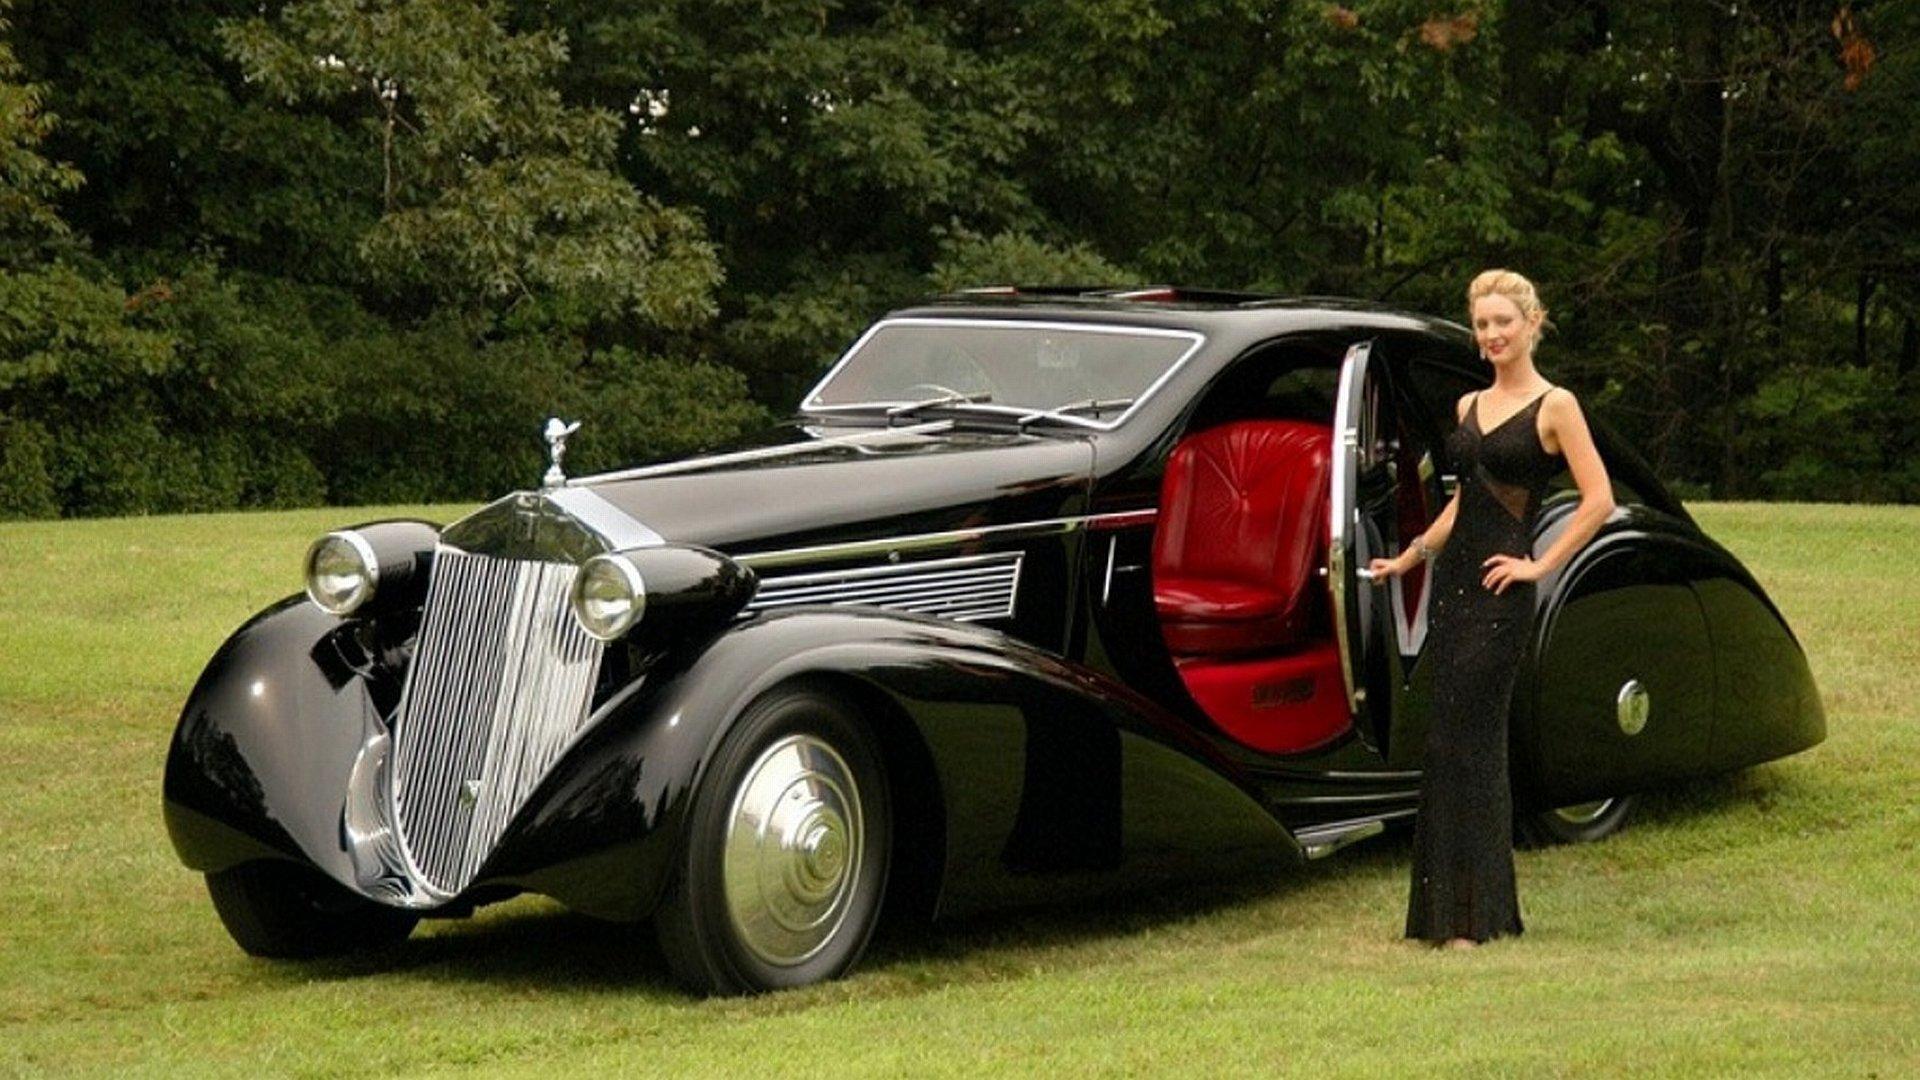 1925 Rolls Royce Phantom >> 1925 Rolls Royce Phantom Hd Wallpaper Background Image